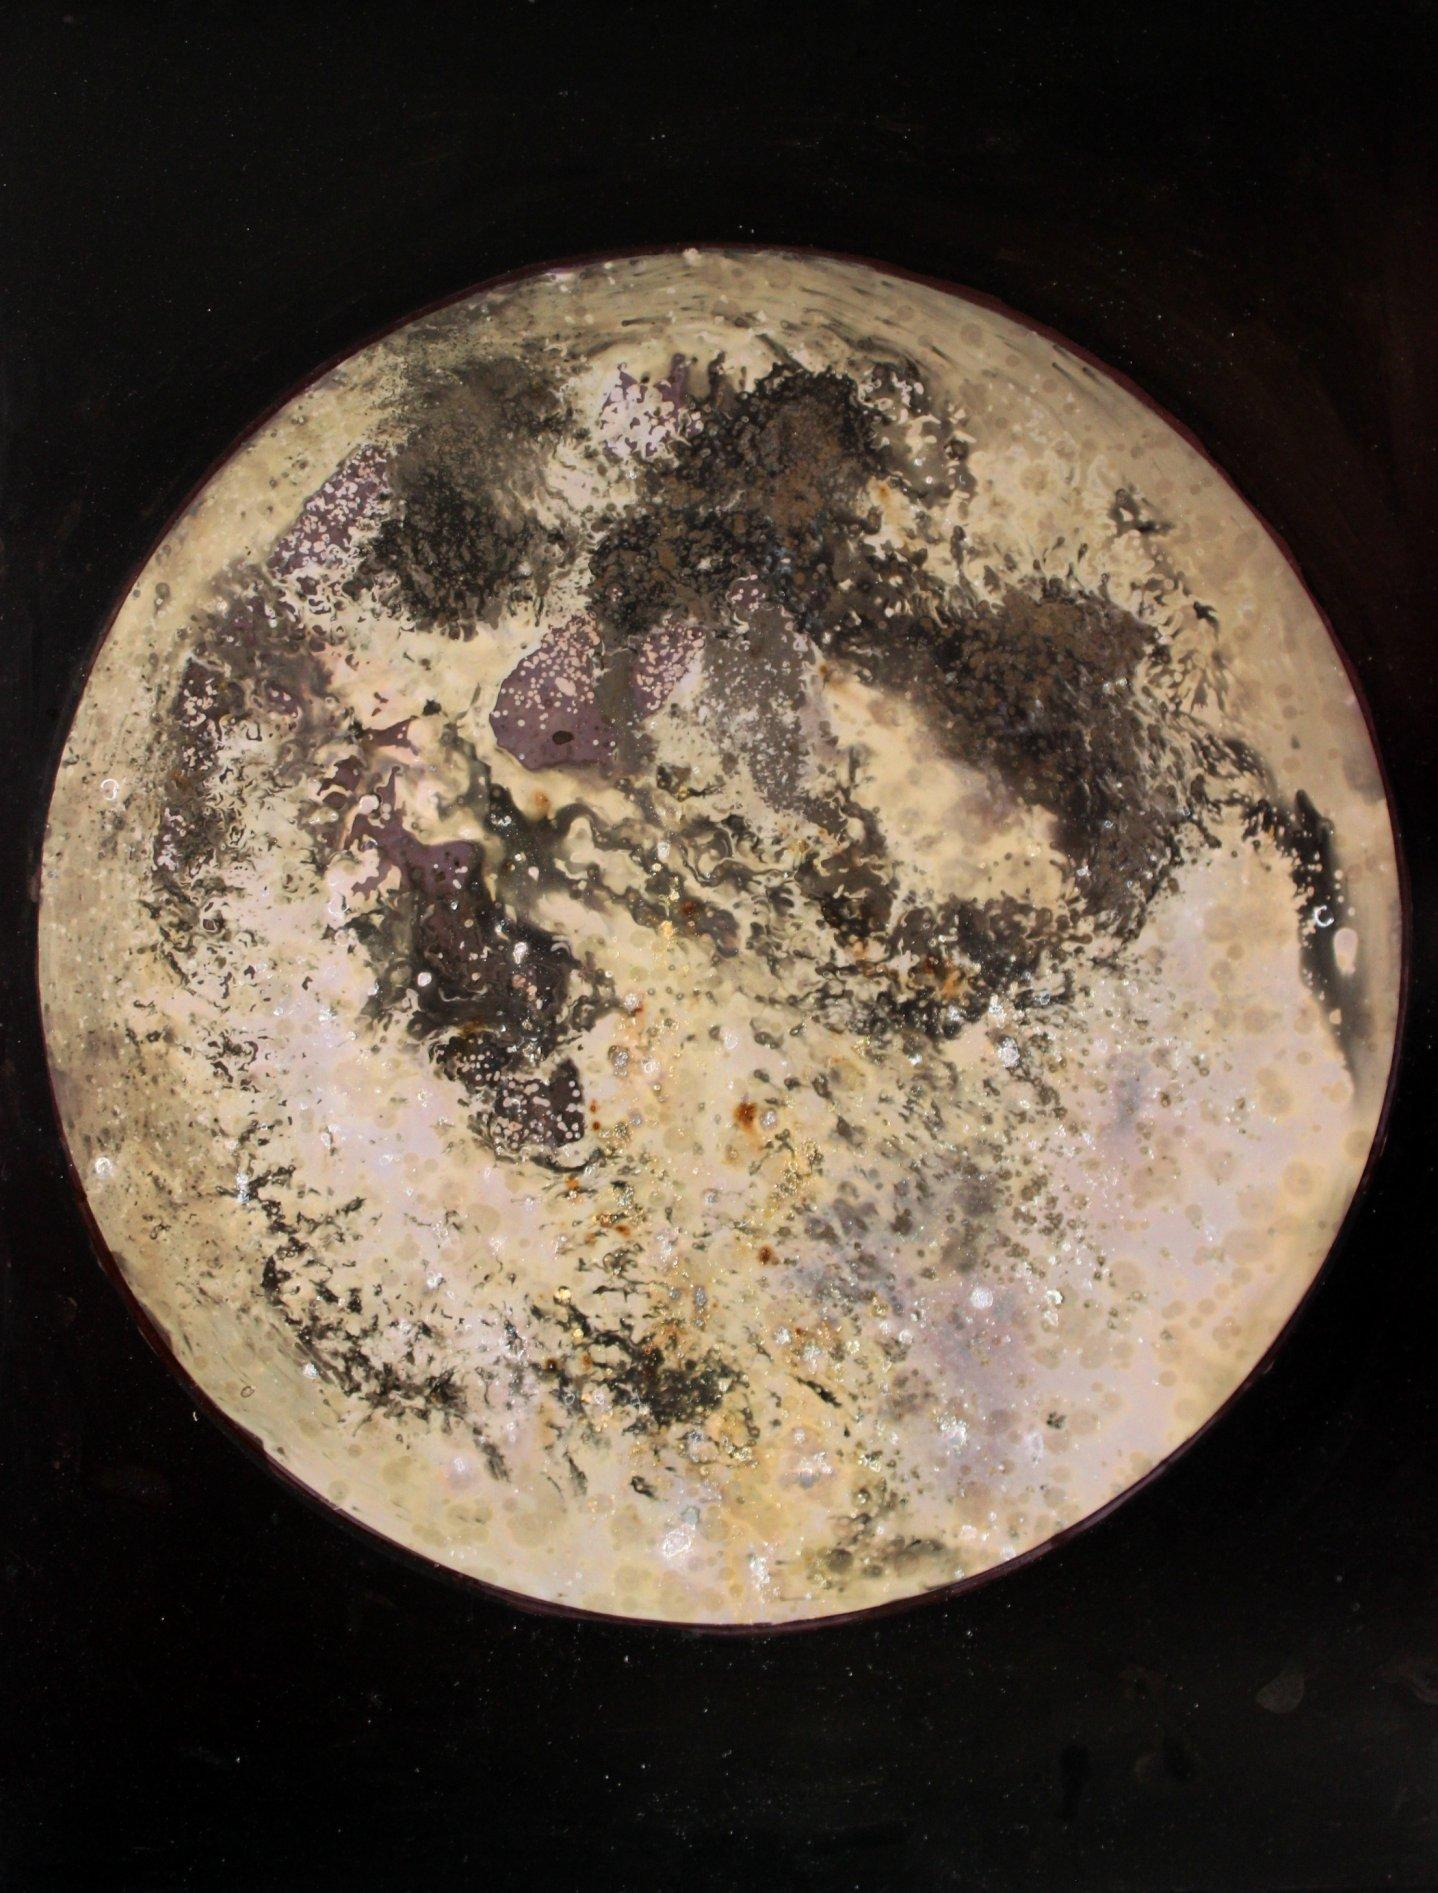 New Horizons (Calendario) (2016) - Carlos Carmona - dissidenxia